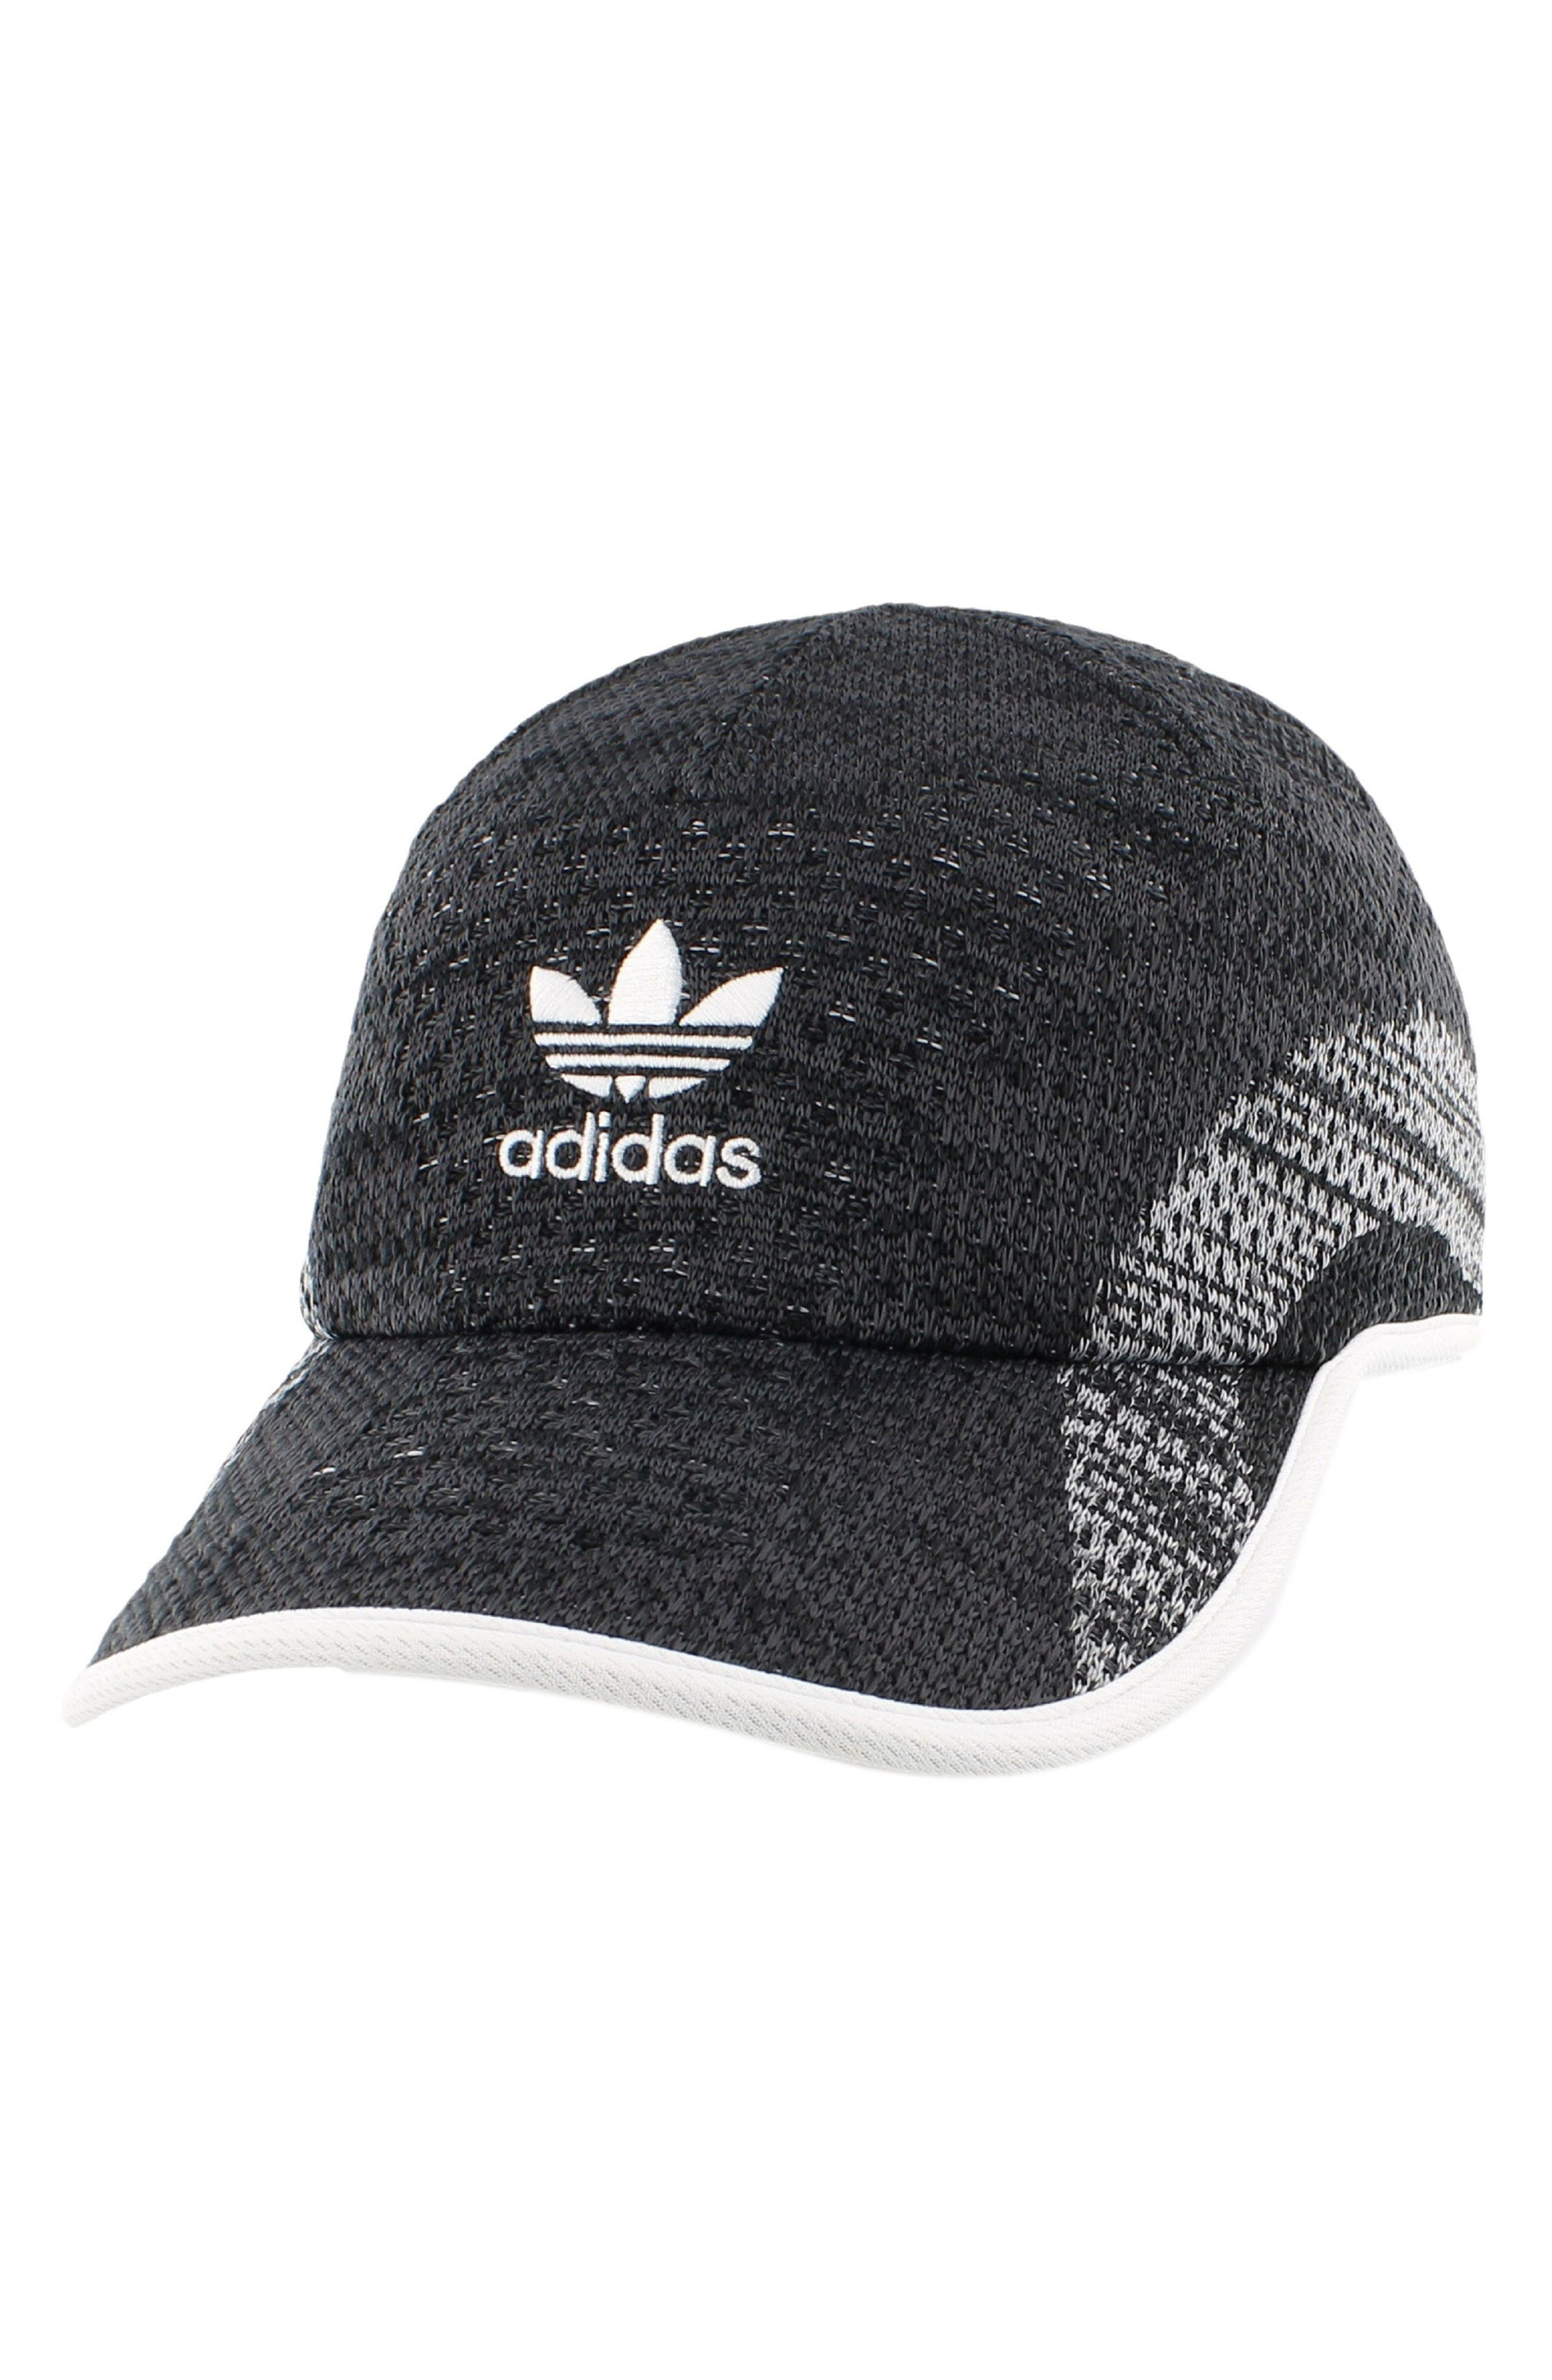 Primeknit Ball Cap,                             Main thumbnail 1, color,                             Black/ Dark Grey/ White